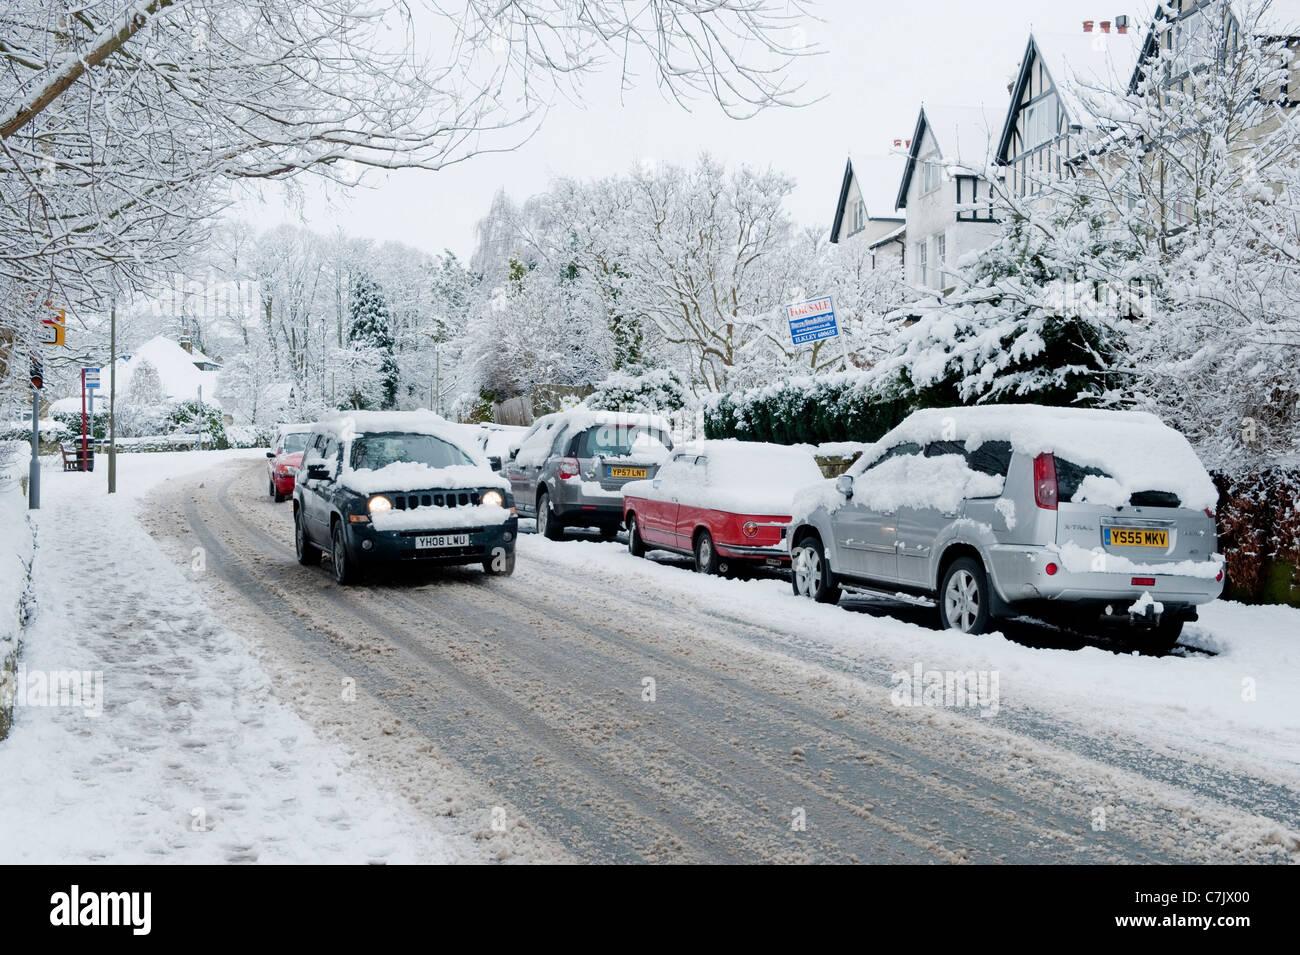 A snowy street scene. - Stock Image